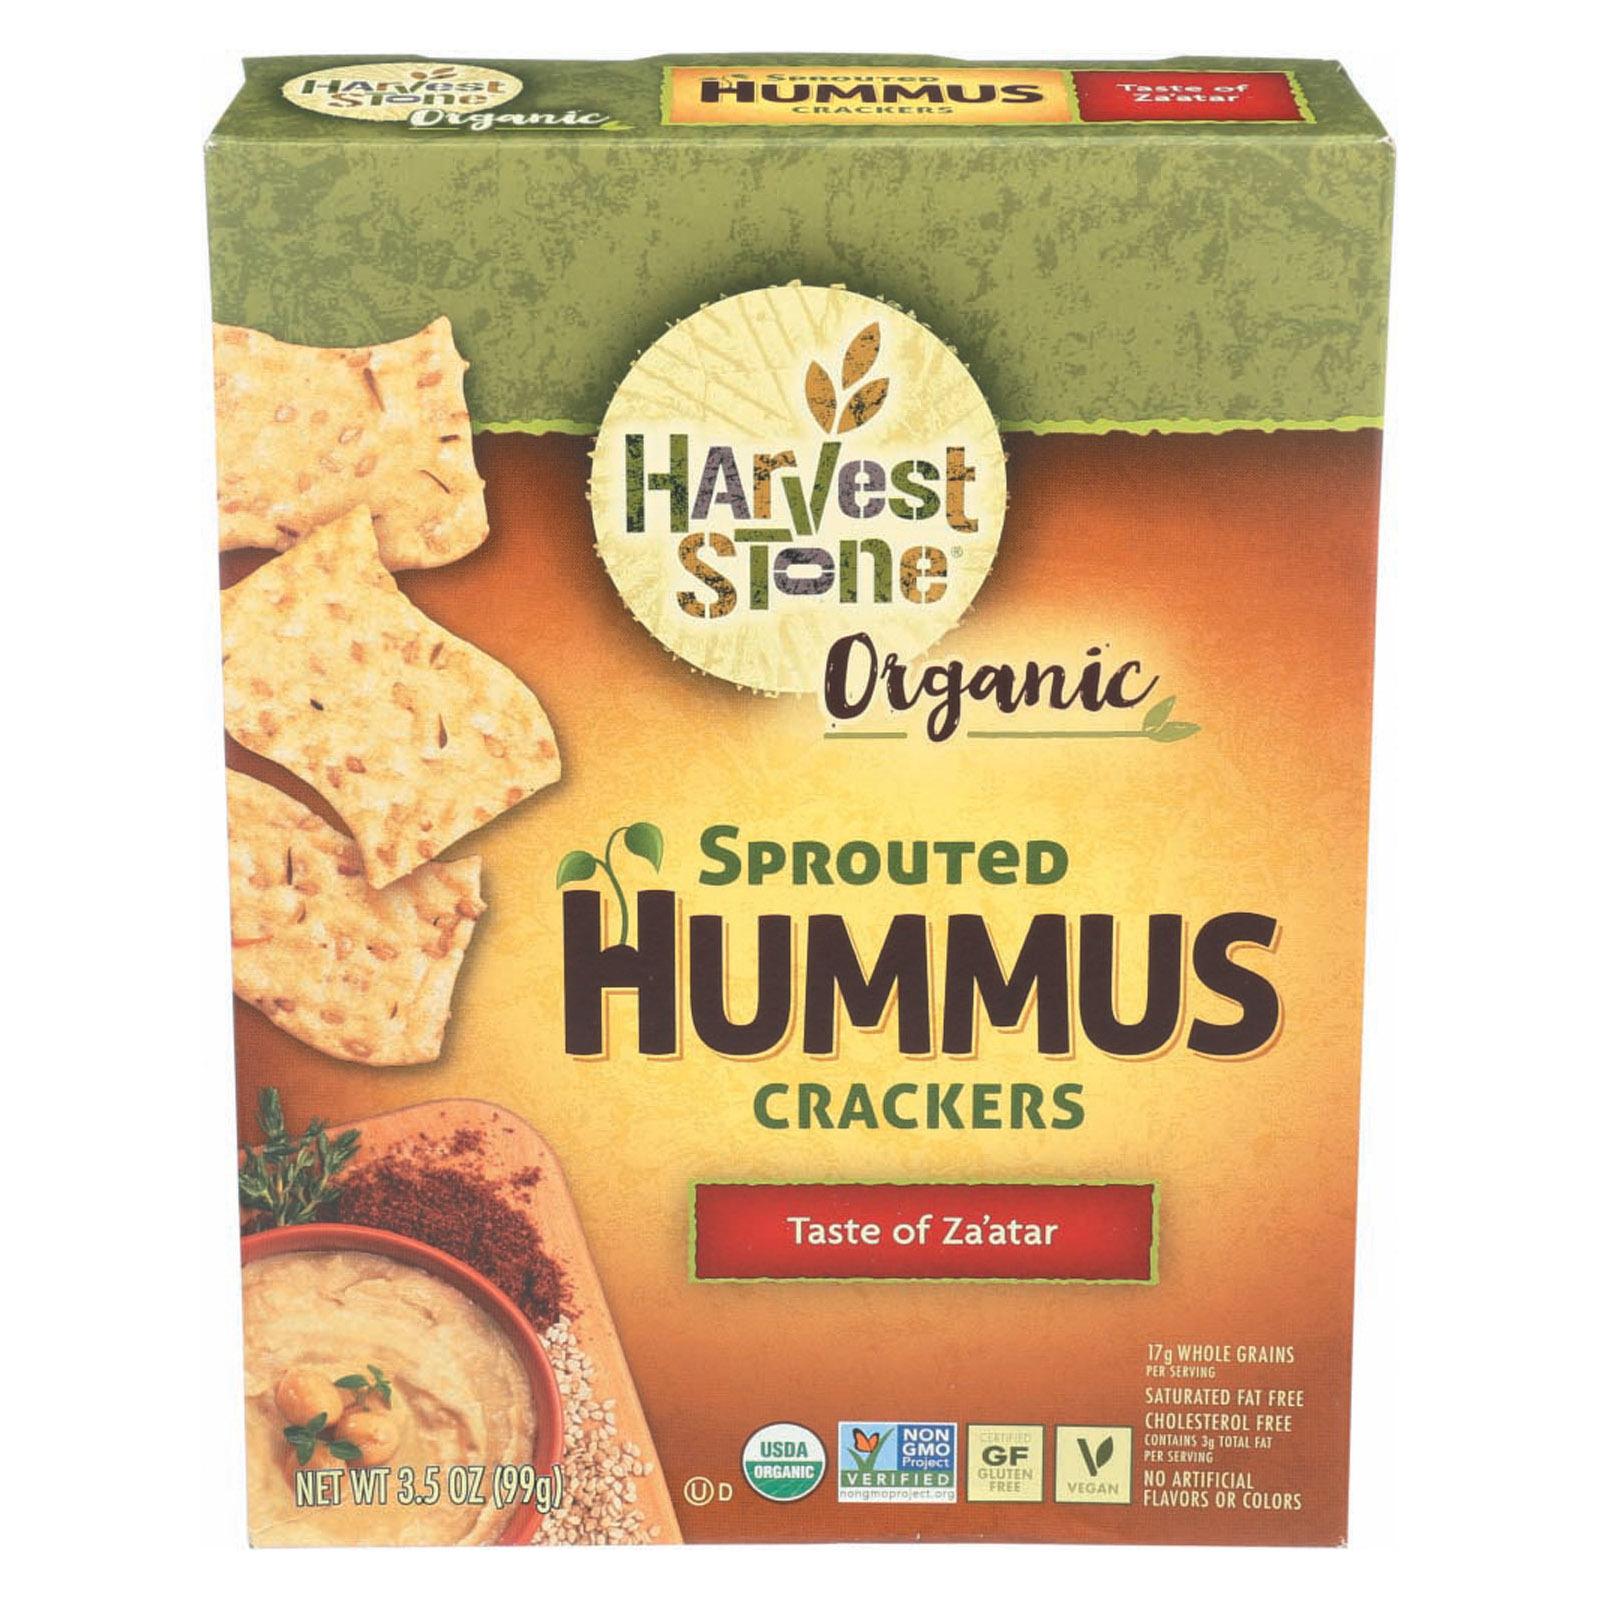 Harvest Stone Organic Hummus Crackers - Taste of Za'Atar - Case of 6 - 3.5 oz